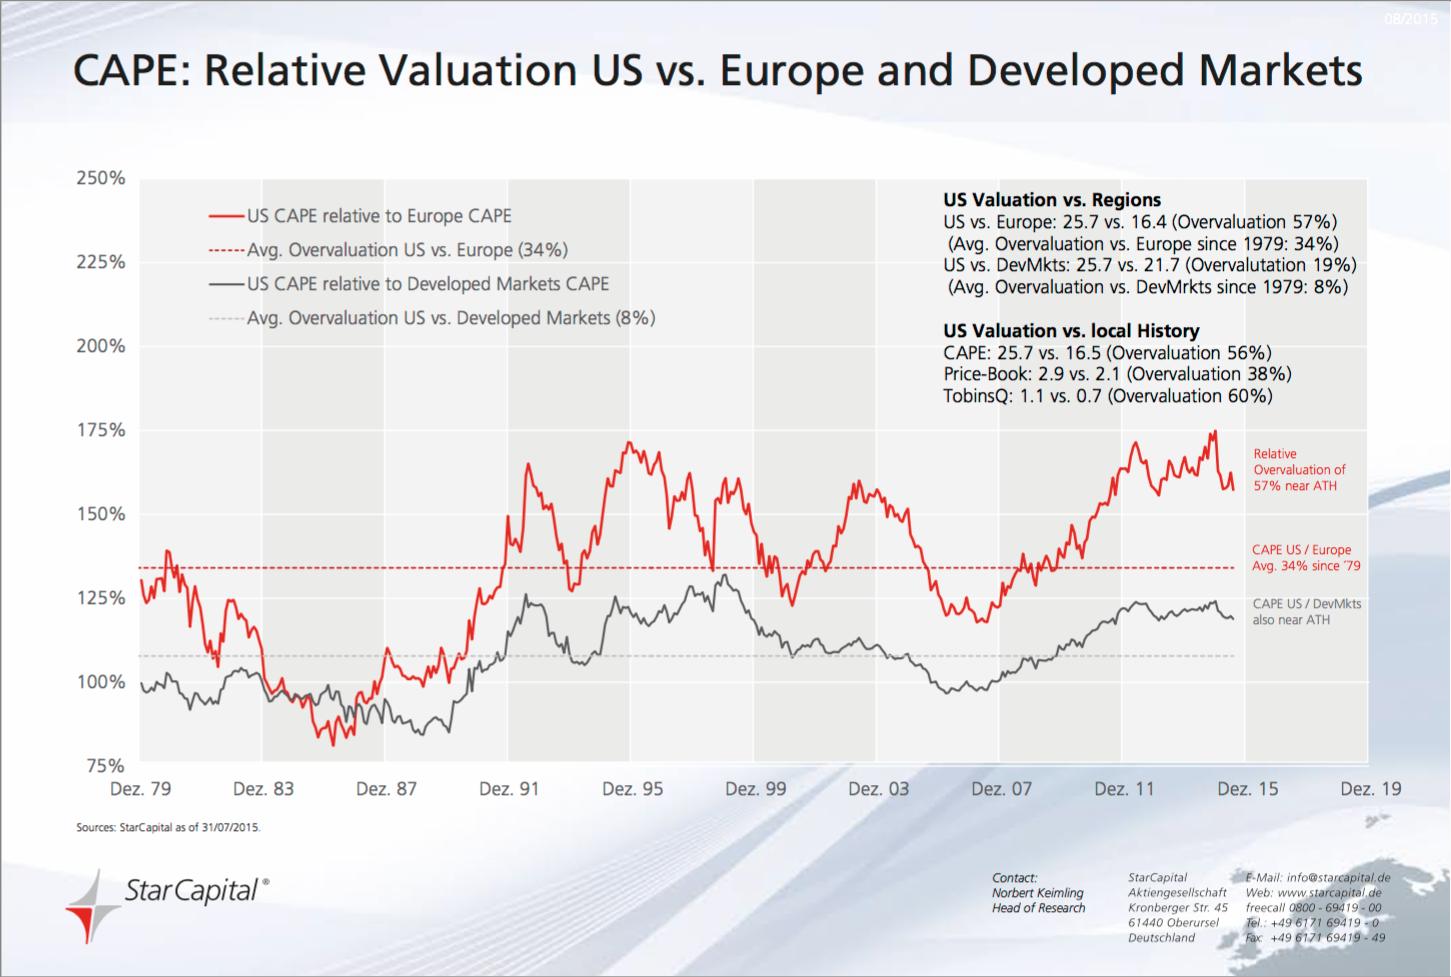 CAPE: Relative Valuation